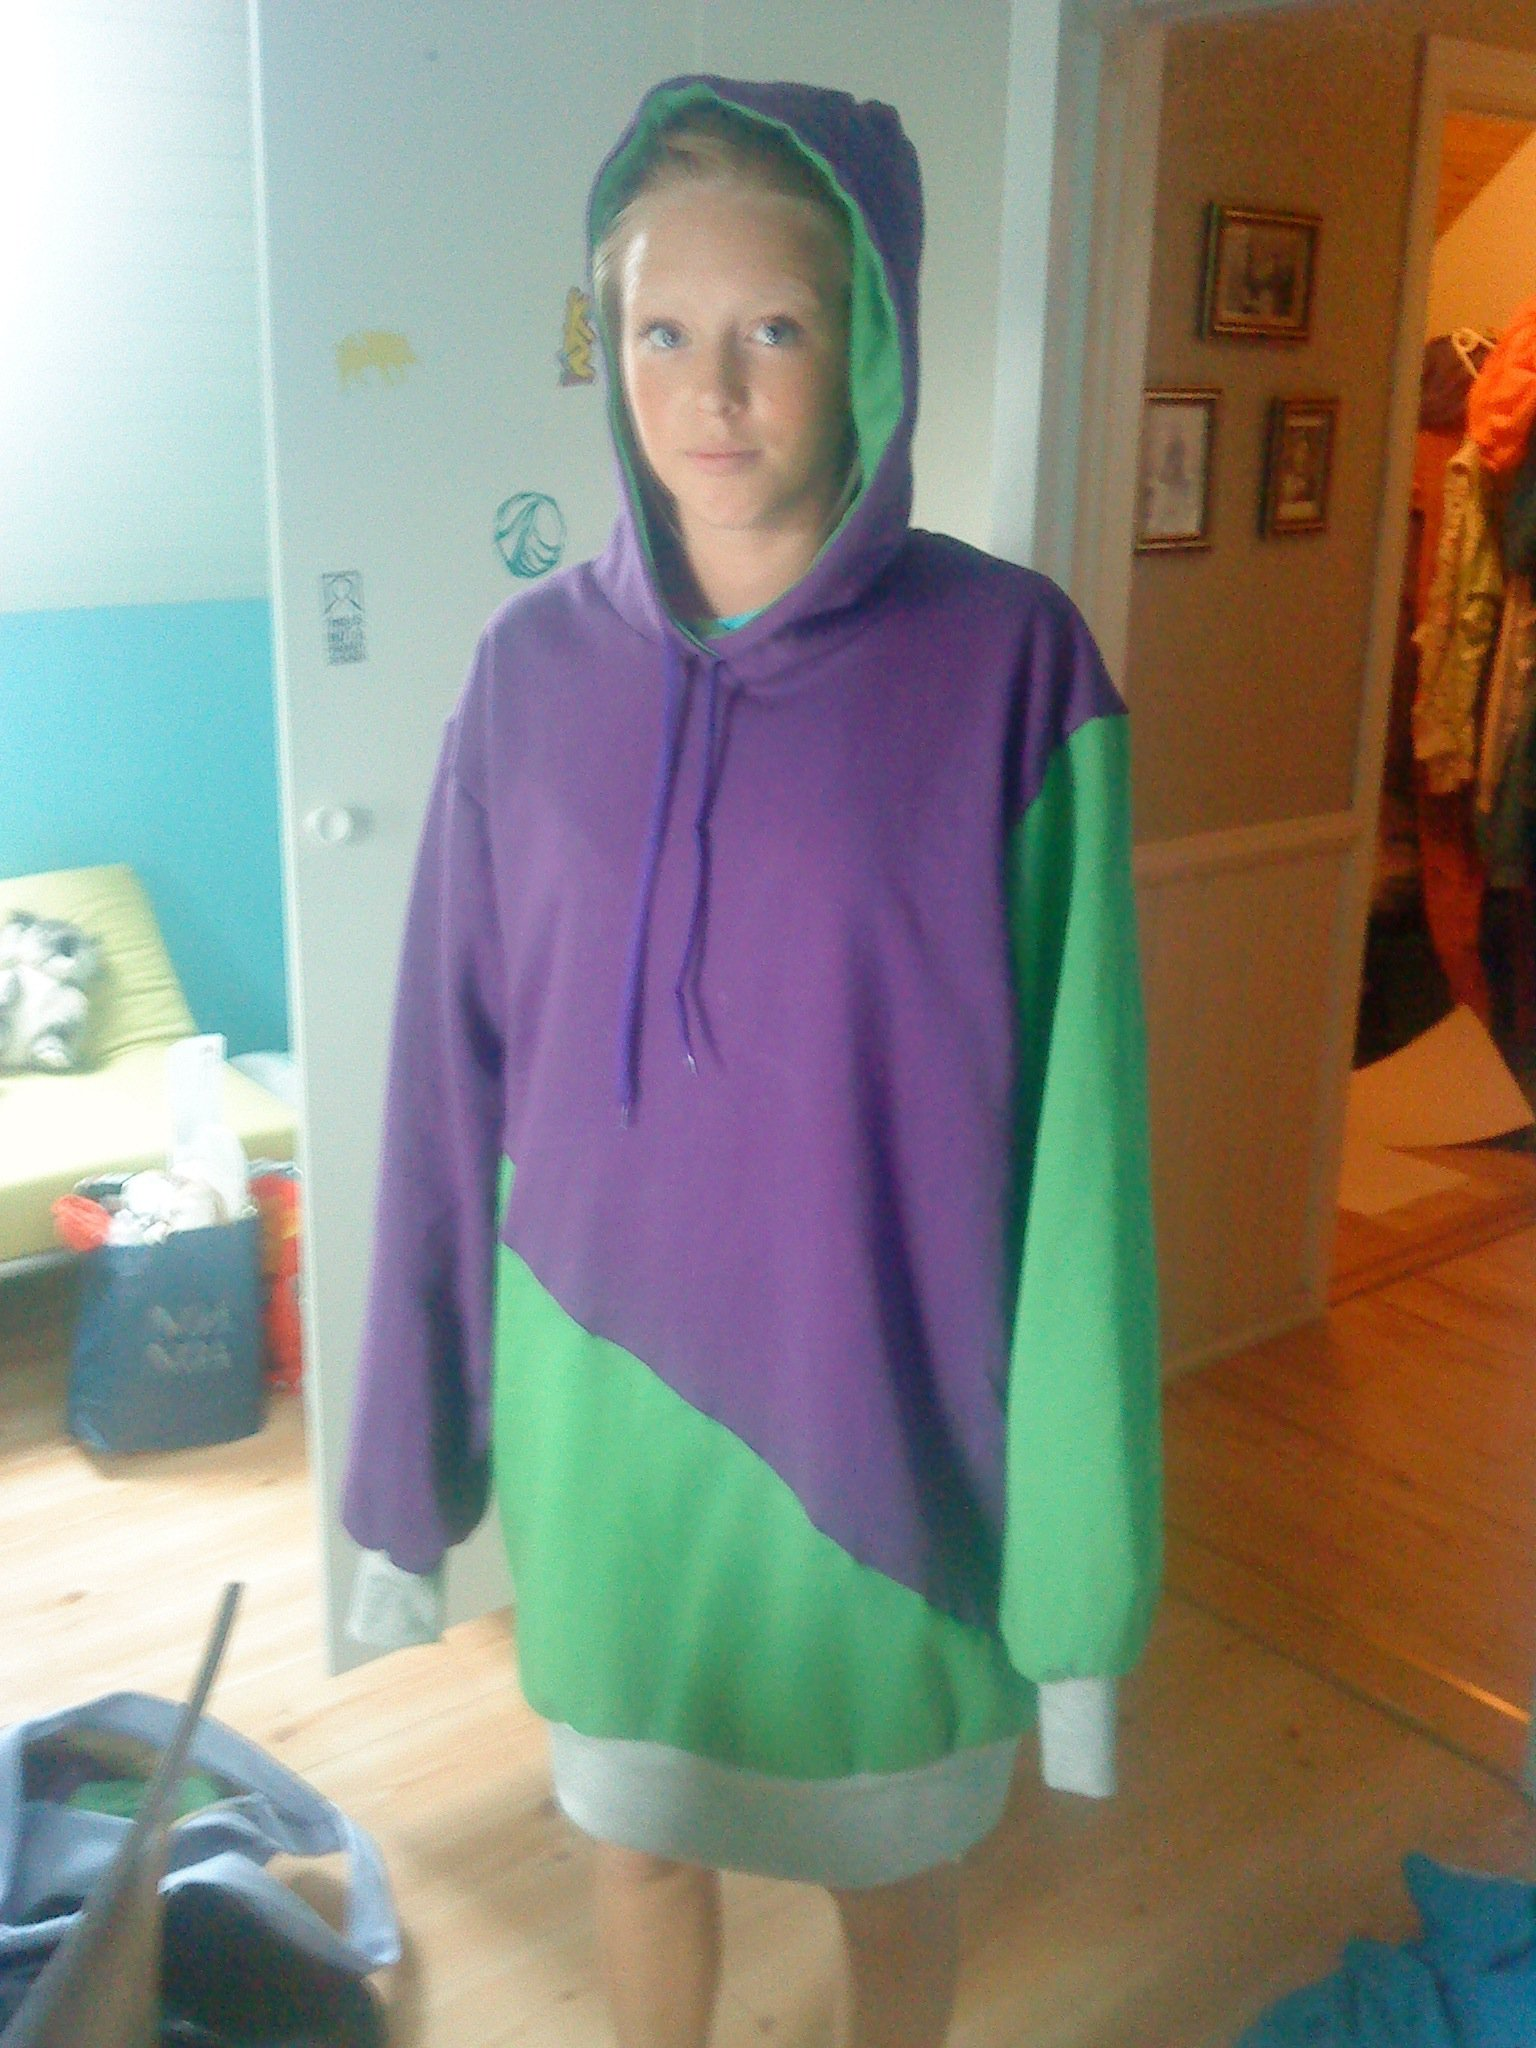 Homemade hoodie